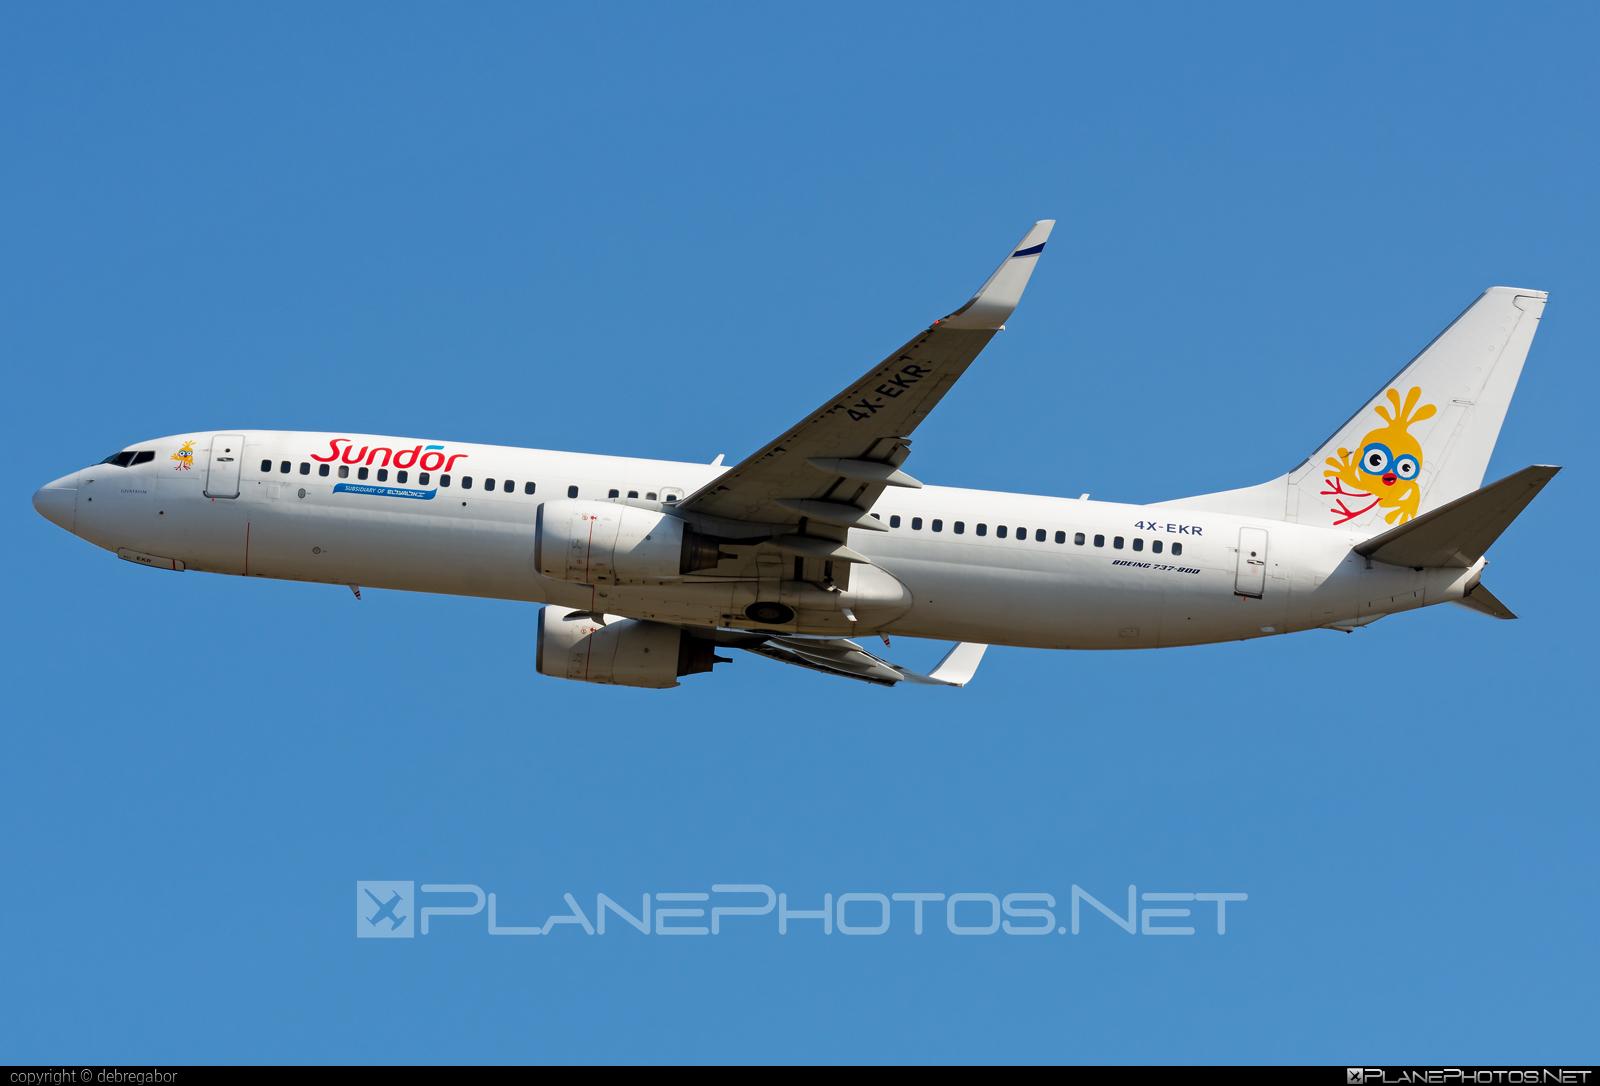 Boeing 737-800 - 4X-EKR operated by Sun d`Or International Airlines #b737 #b737nextgen #b737ng #boeing #boeing737